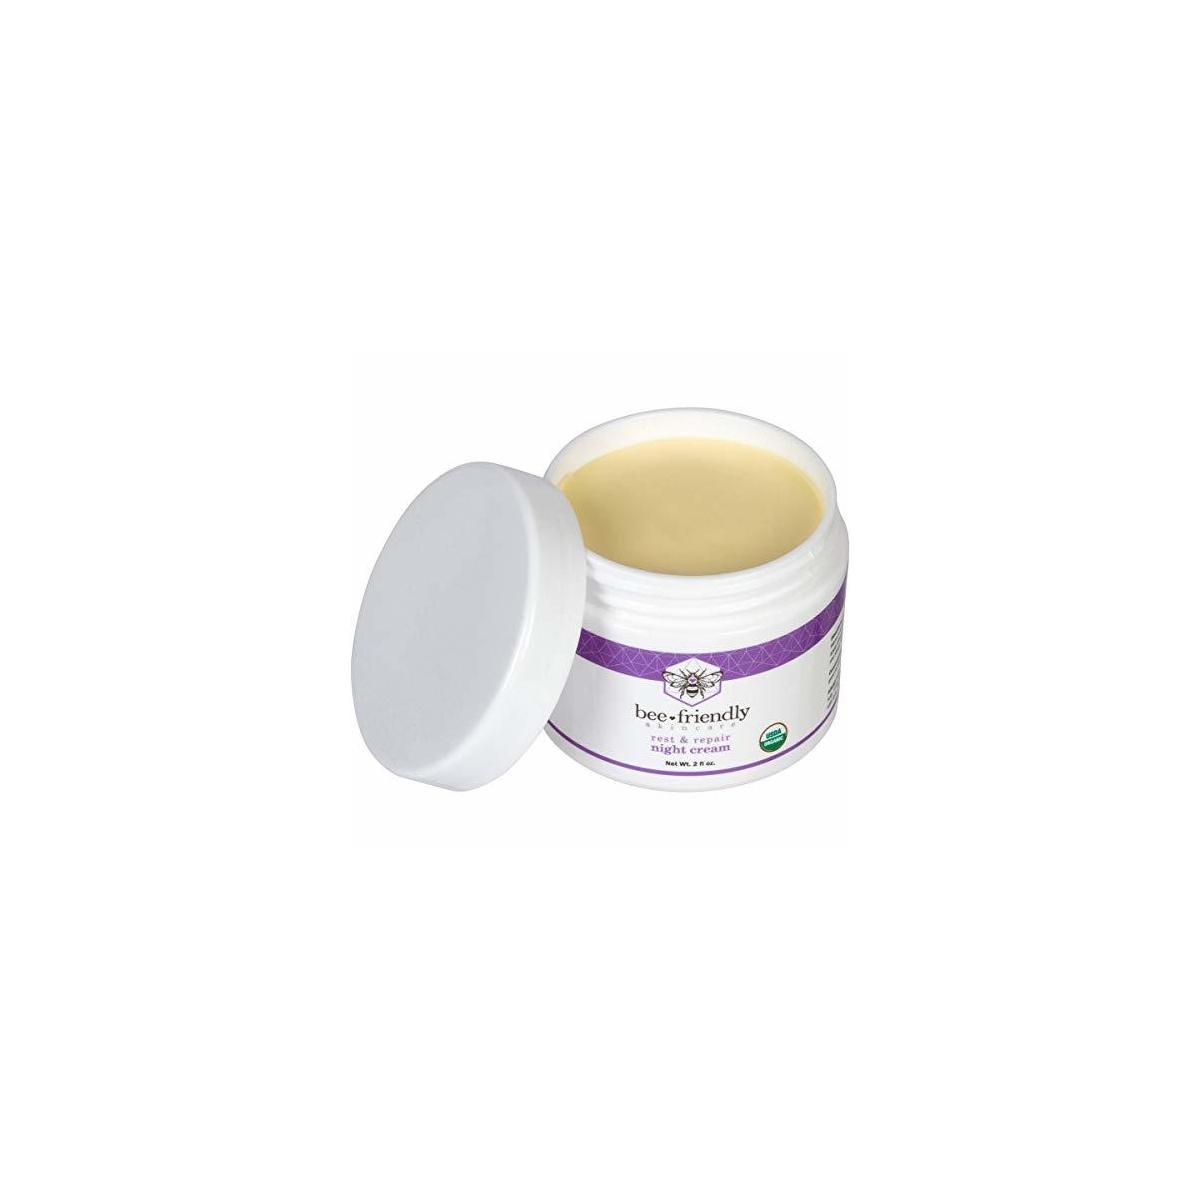 Best Night Cream Natural USDA Certified Organic Night Cream By BeeFriendly, Anti Wrinkle, Anti Aging, Deep Hydrating & Moisturizing Night Time Eye, Face, Neck & Decollete Cream for Men and Women 2 oz